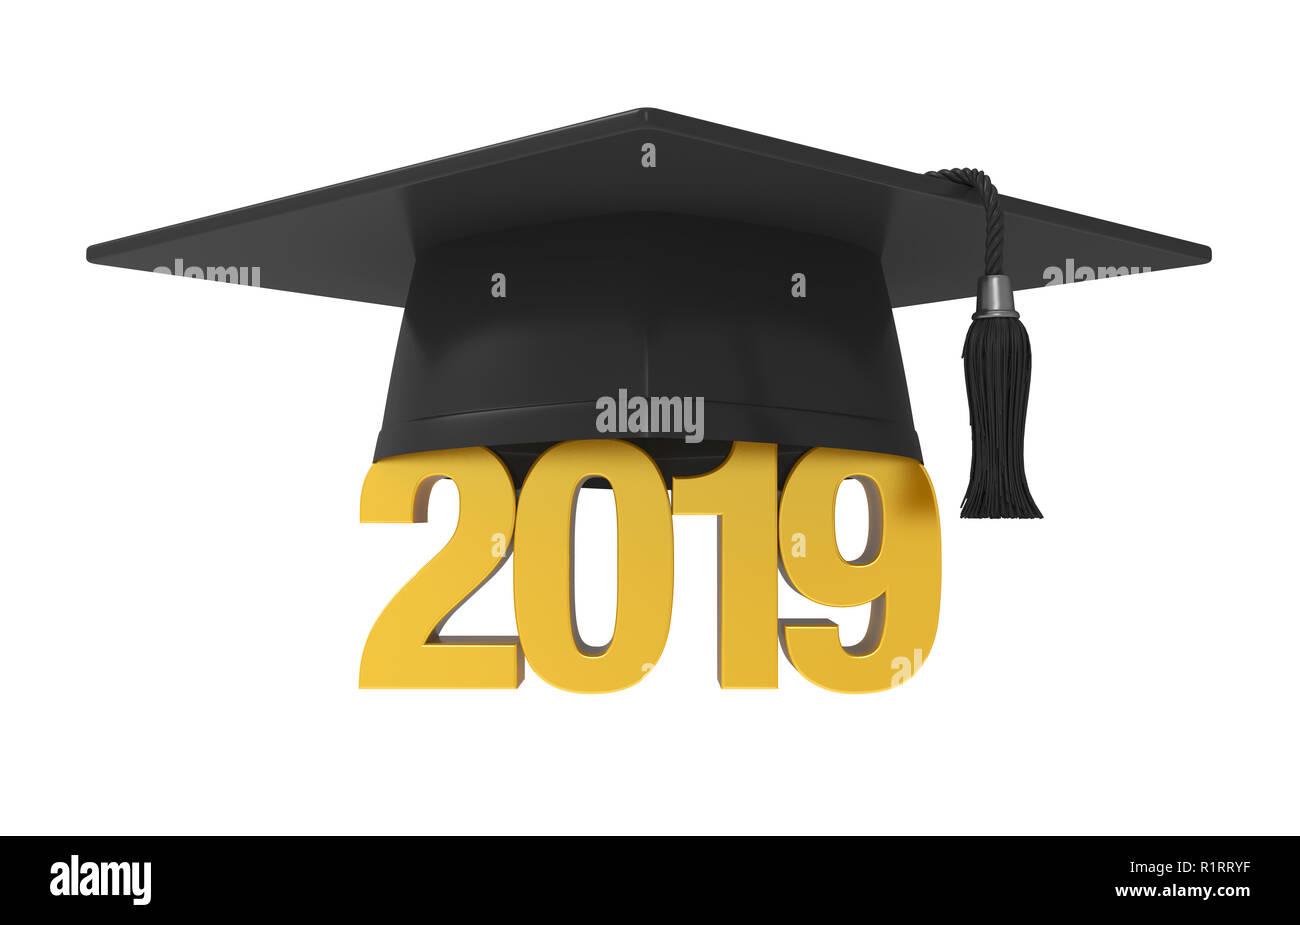 2019 Graduation Cap Isolated Stock Photo: 224873139 - Alamy